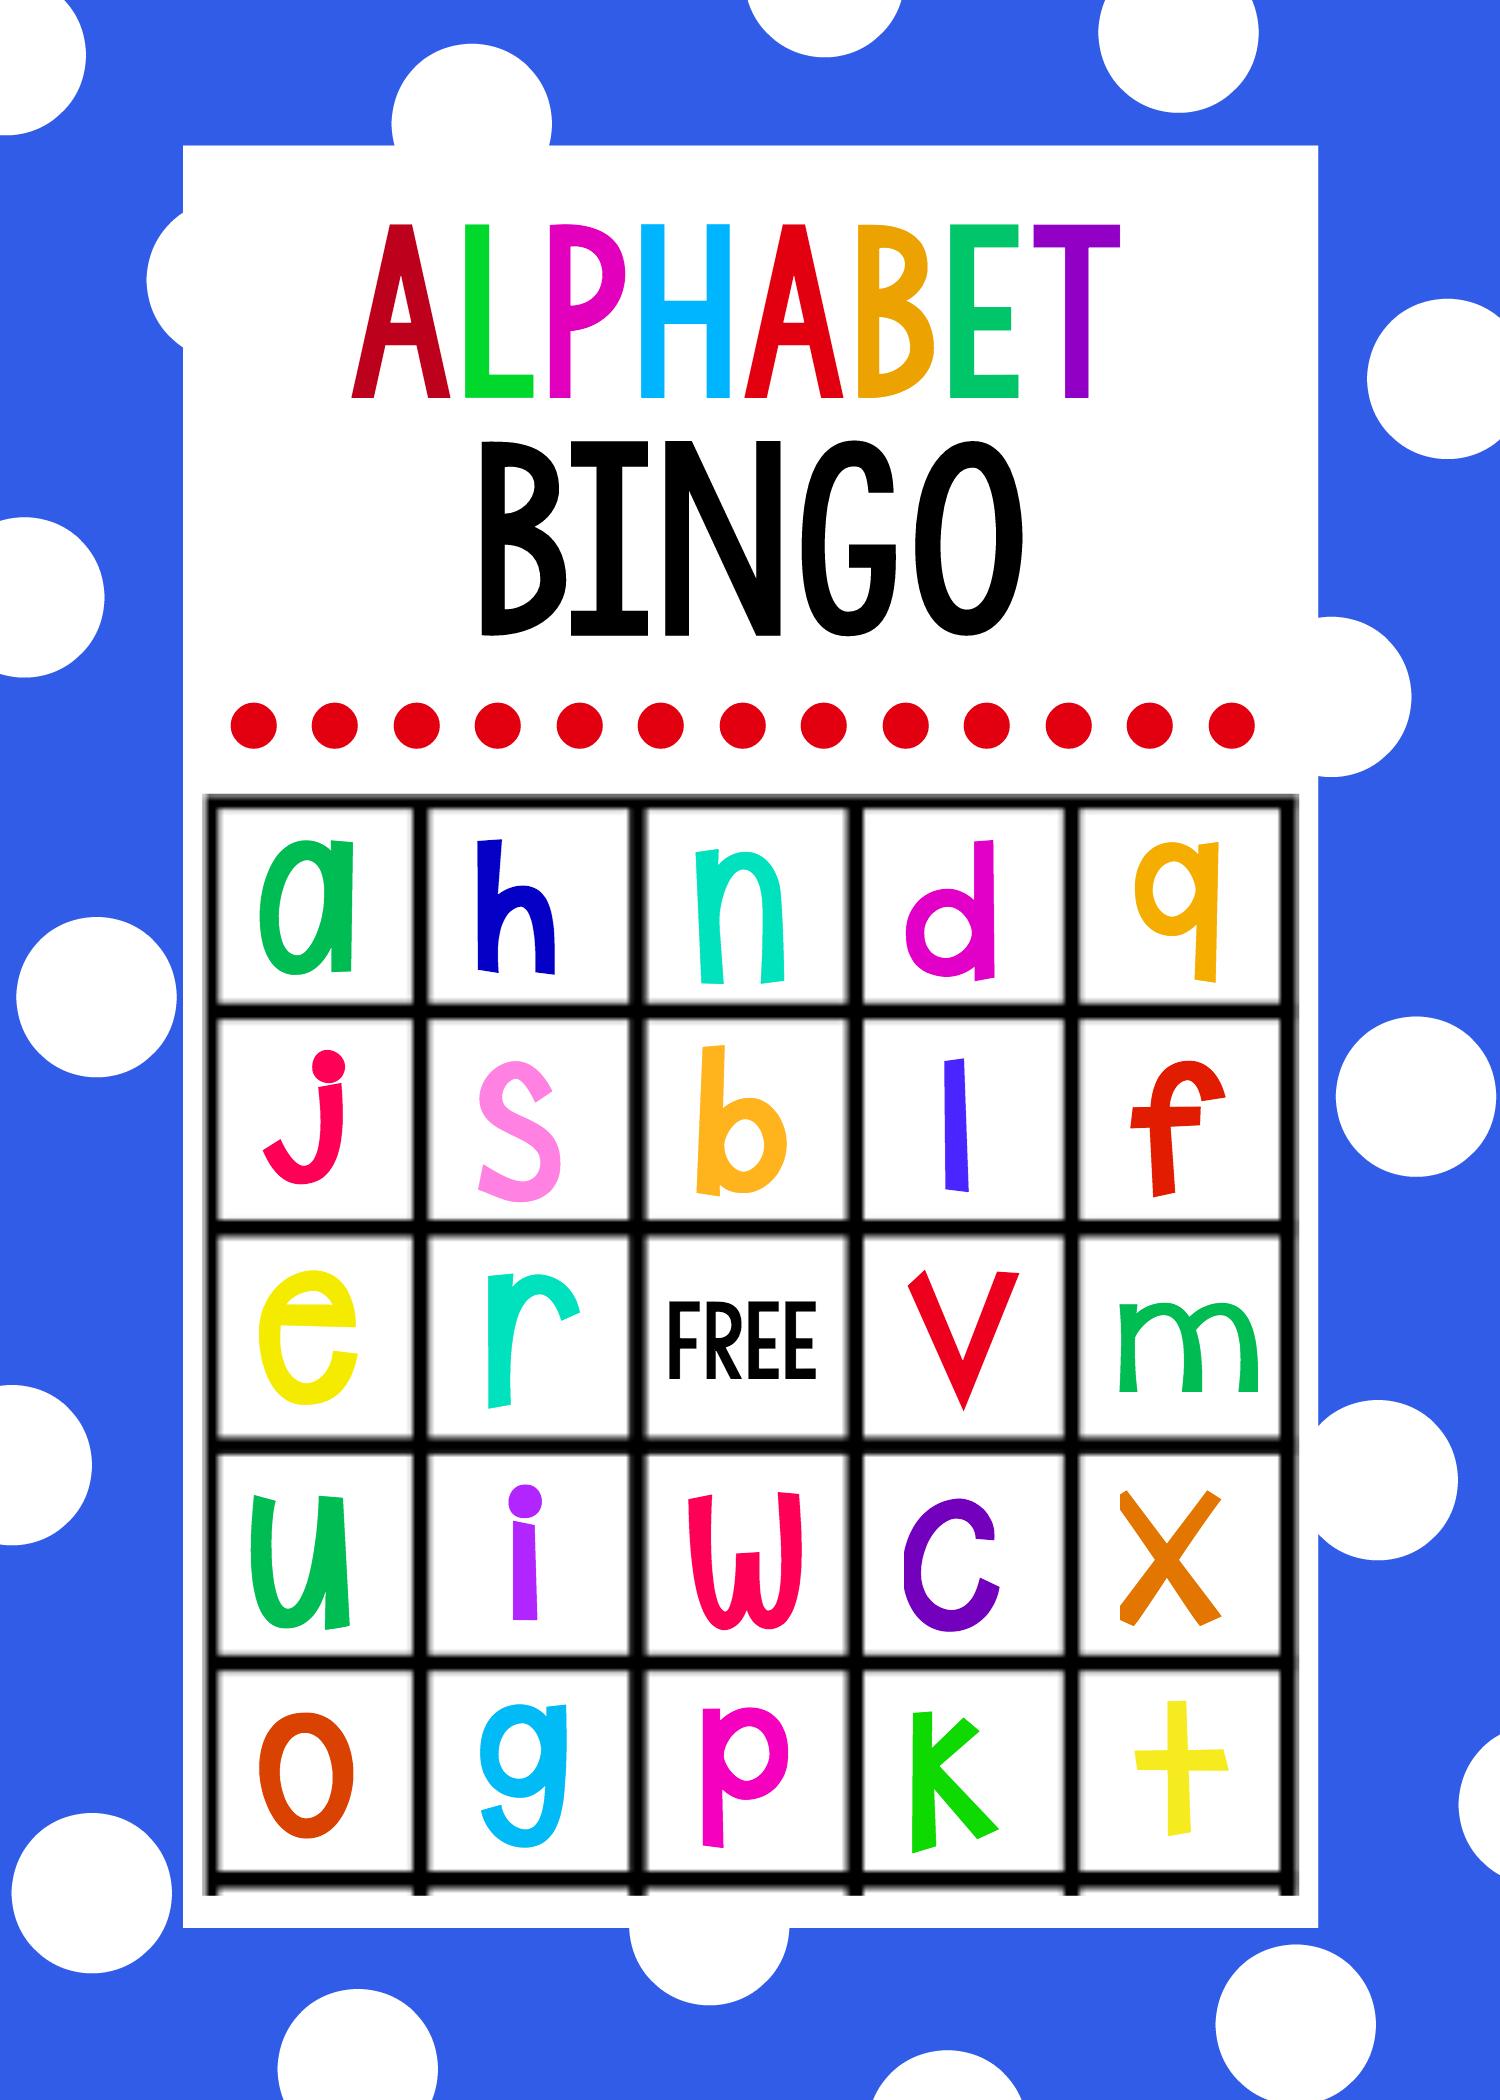 Free Printable Alphabet Bingo Game. Cute Game To Play With Younger - Free Printable Alphabet Bingo Cards